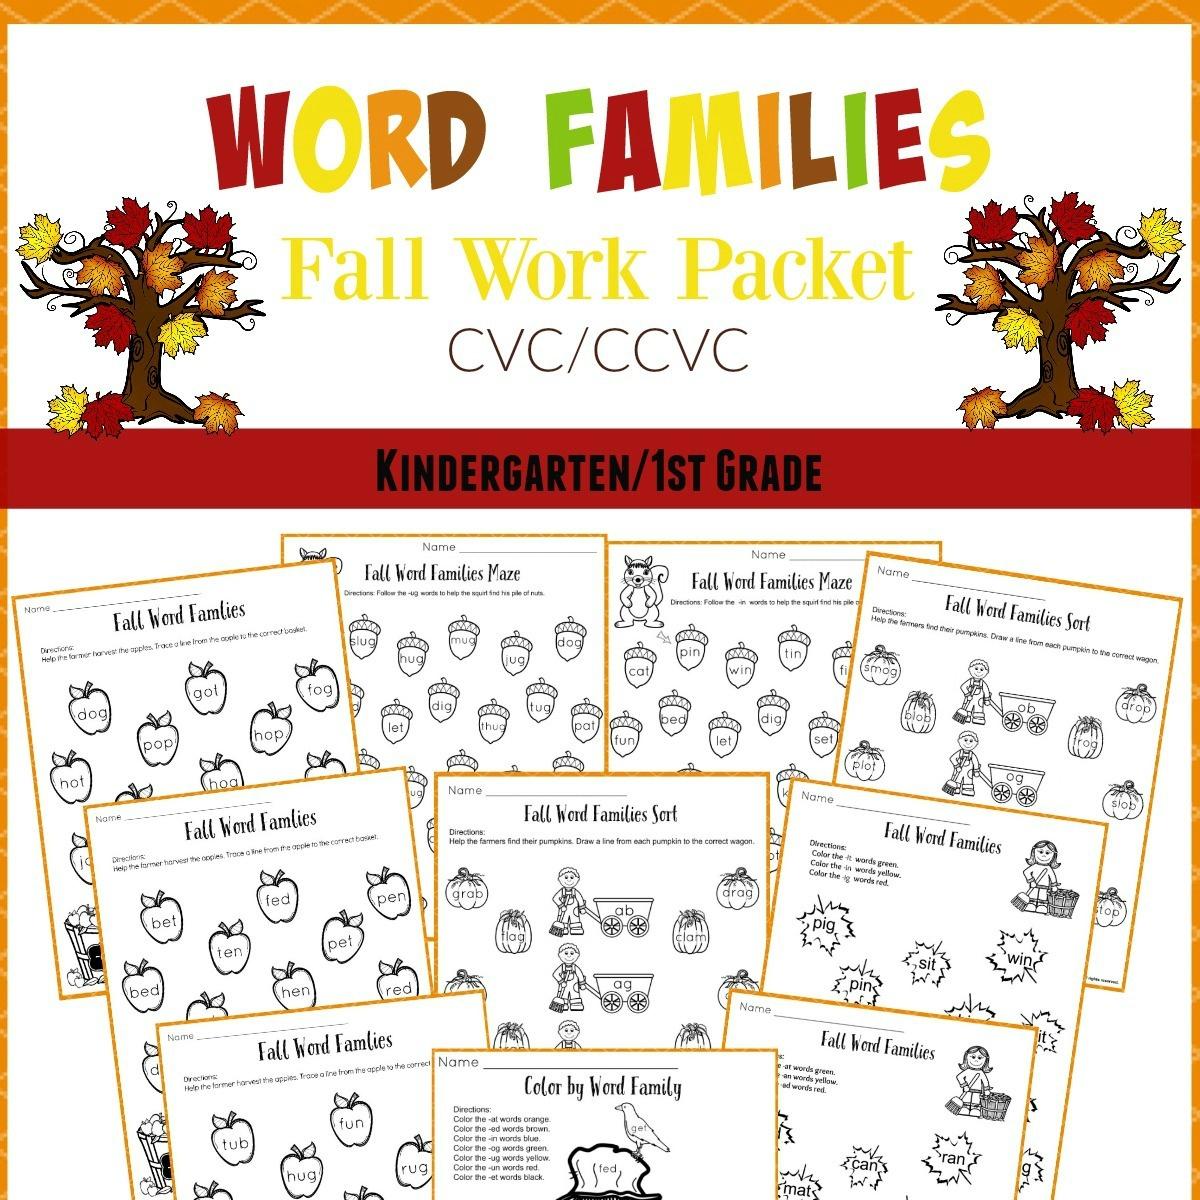 Free Printable Word Family Worksheets For Kindergarten